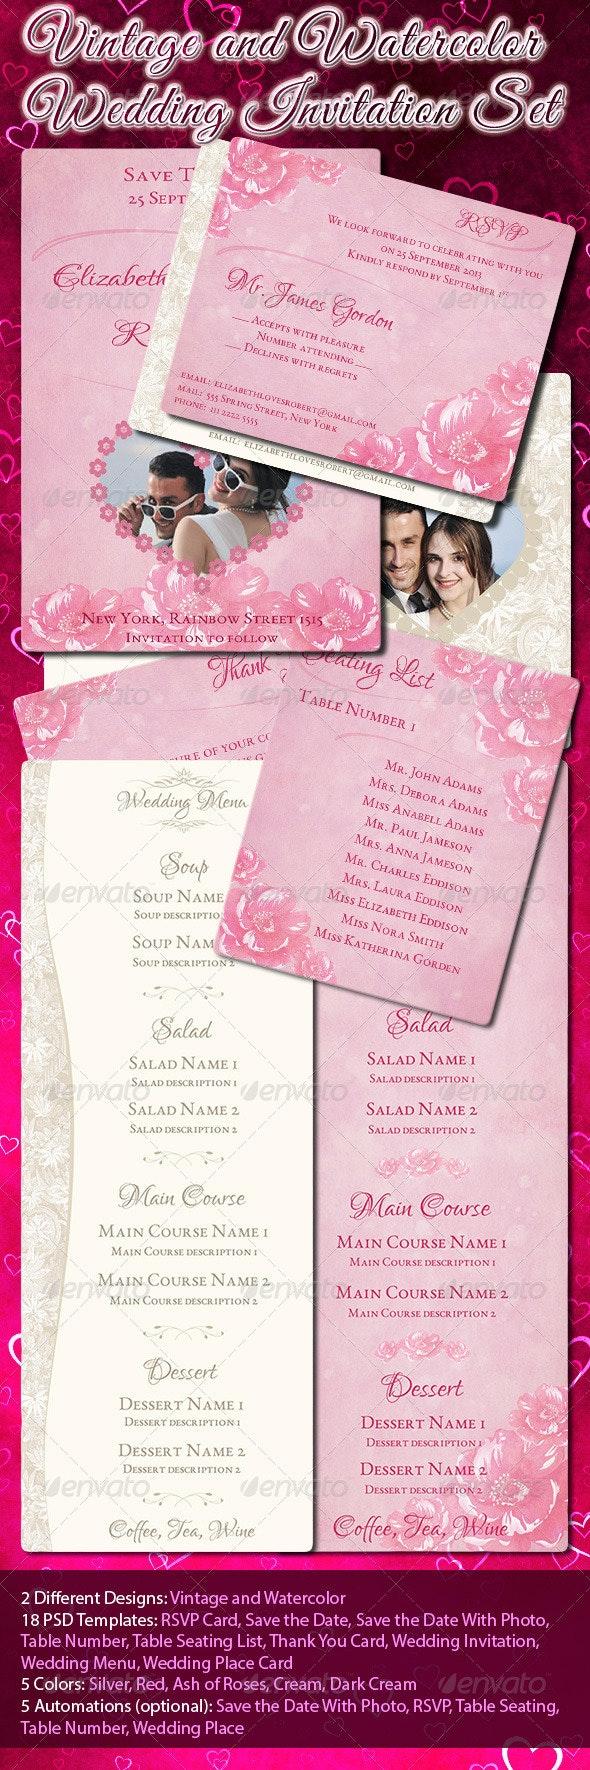 Vintage and Watercolor Wedding Invitation Set - Weddings Cards & Invites